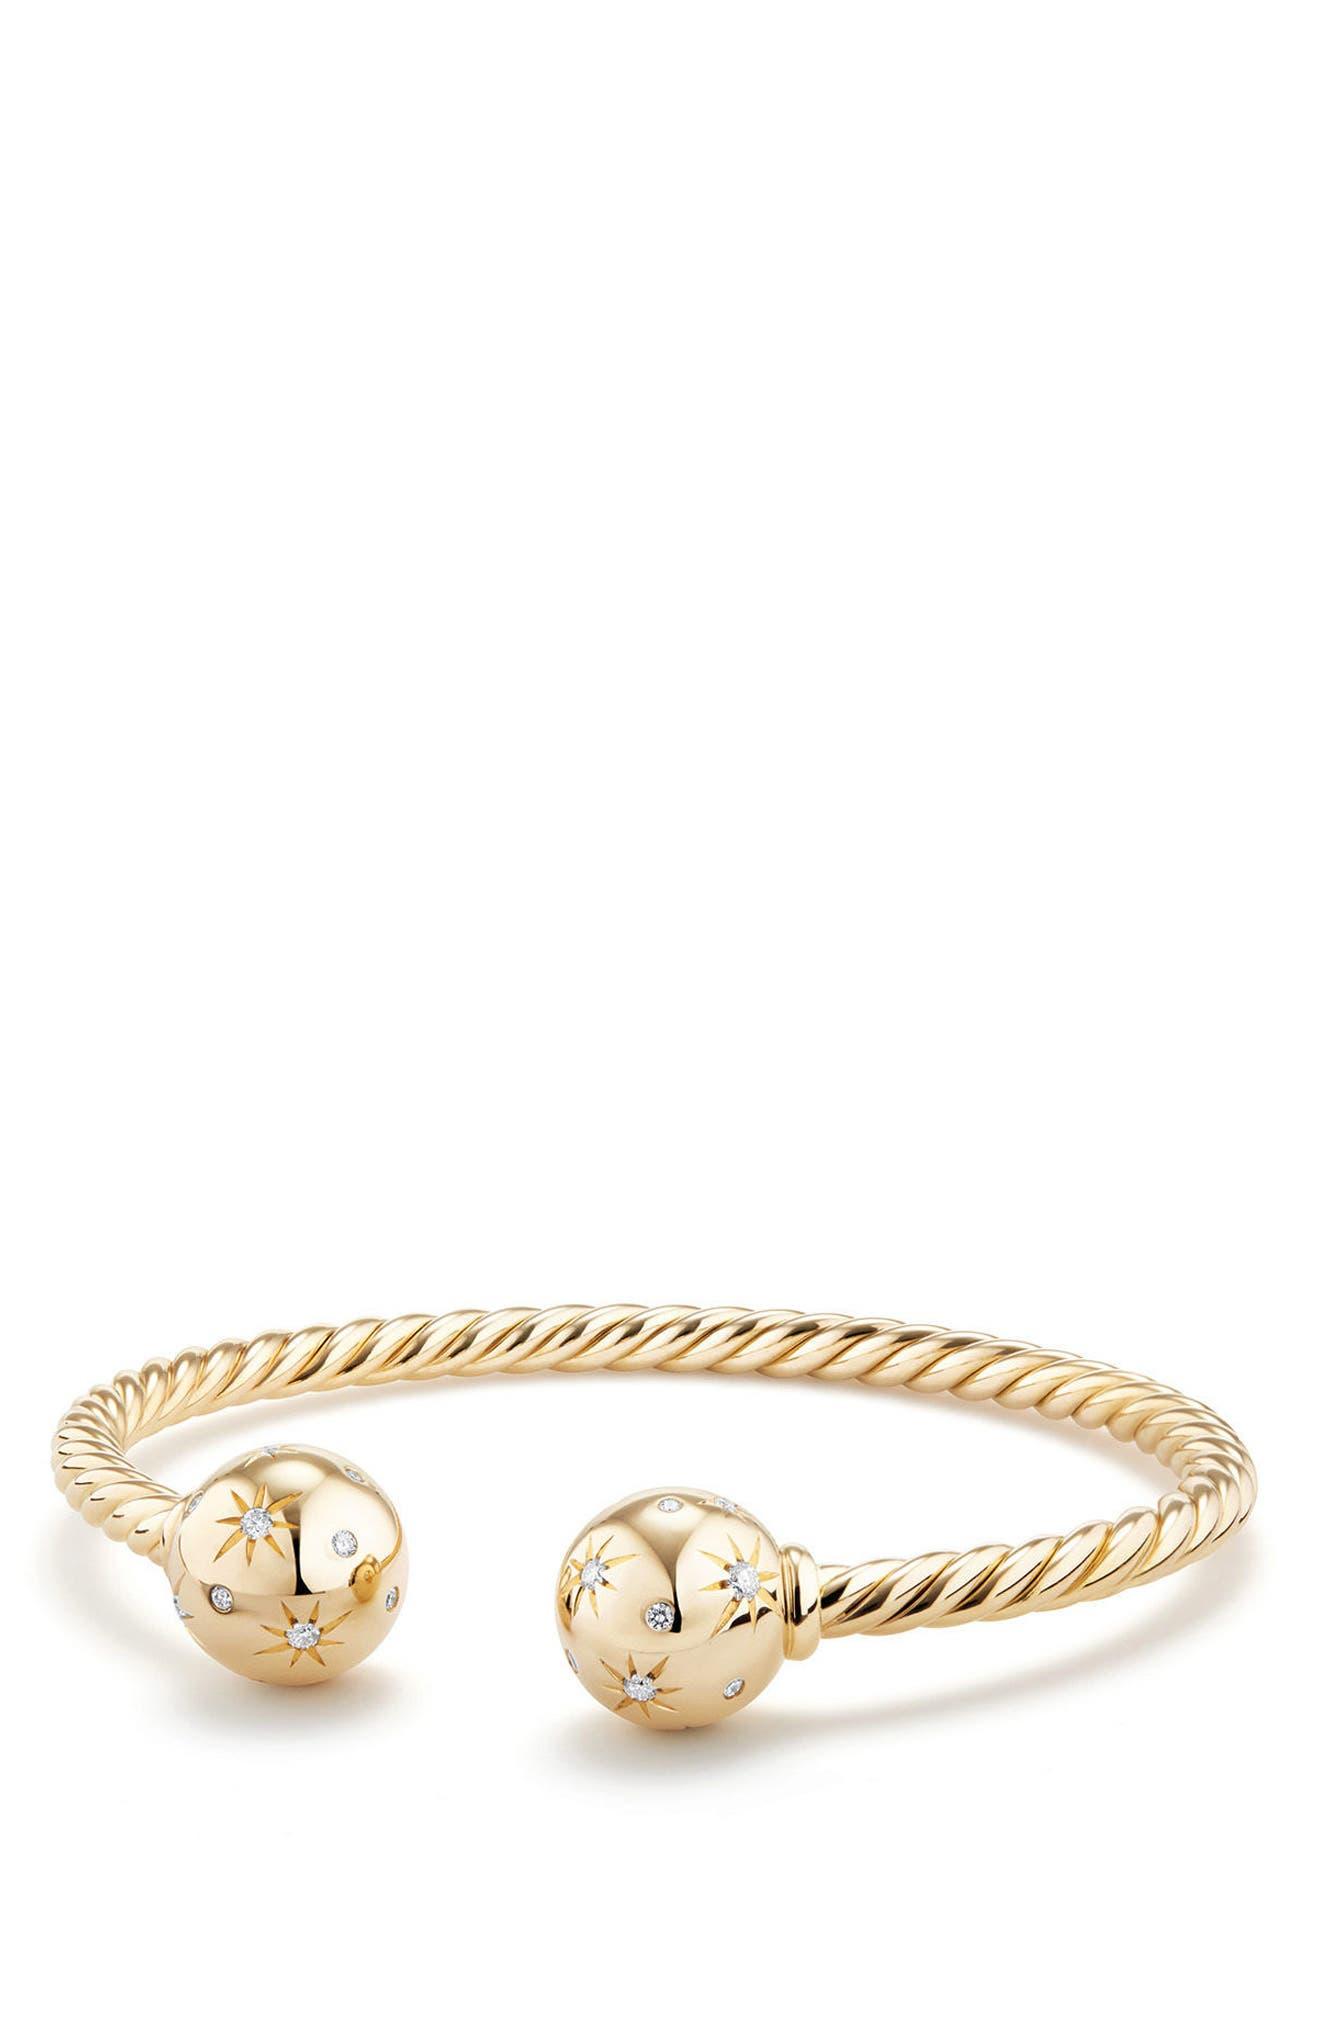 david yurman solari bead bracelet with diamonds in 18k gold